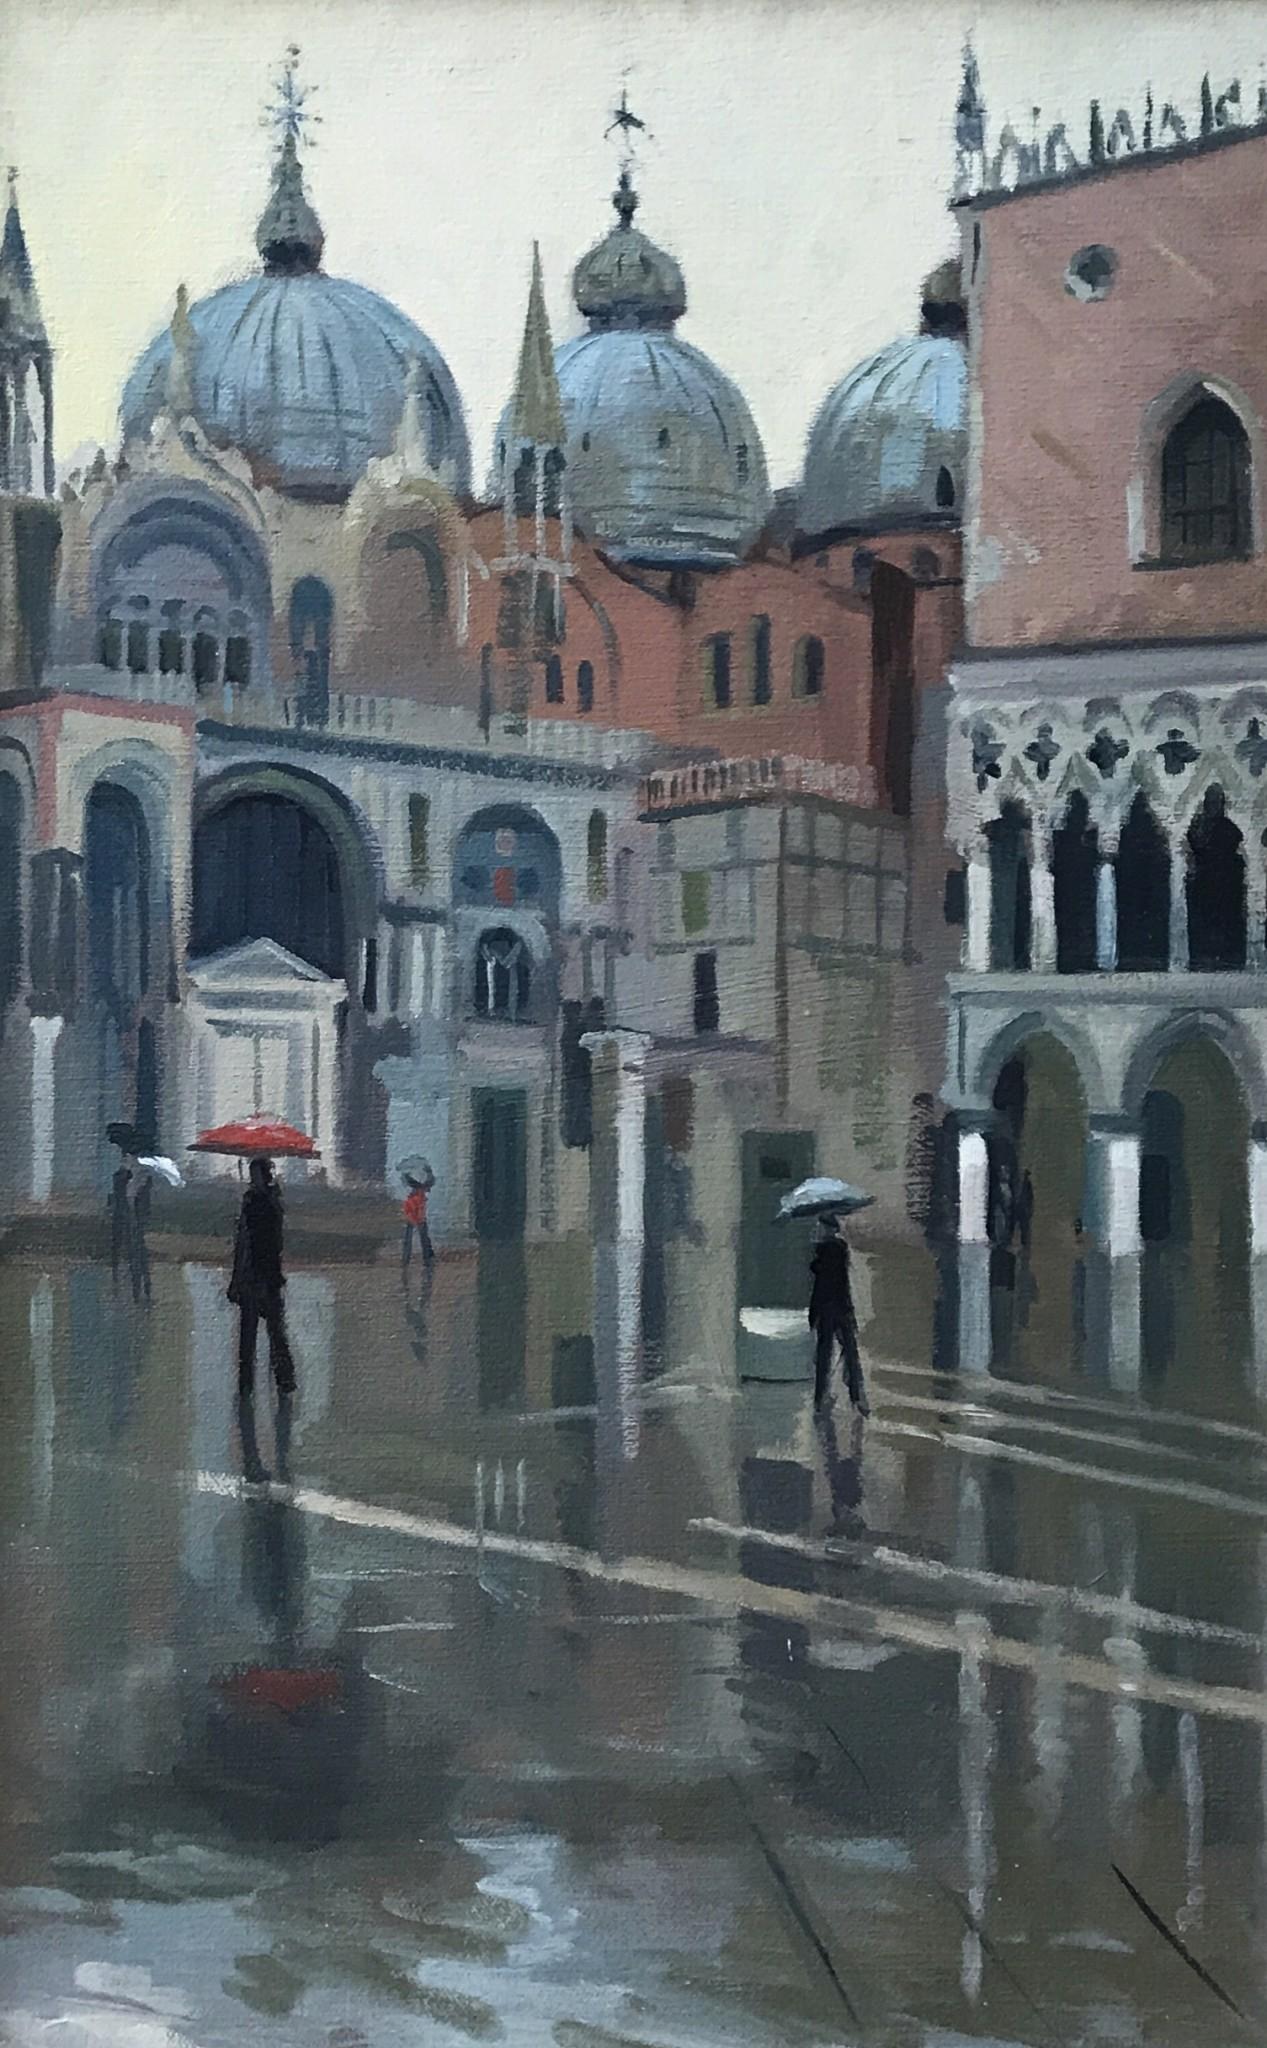 San Marco Rain Effect